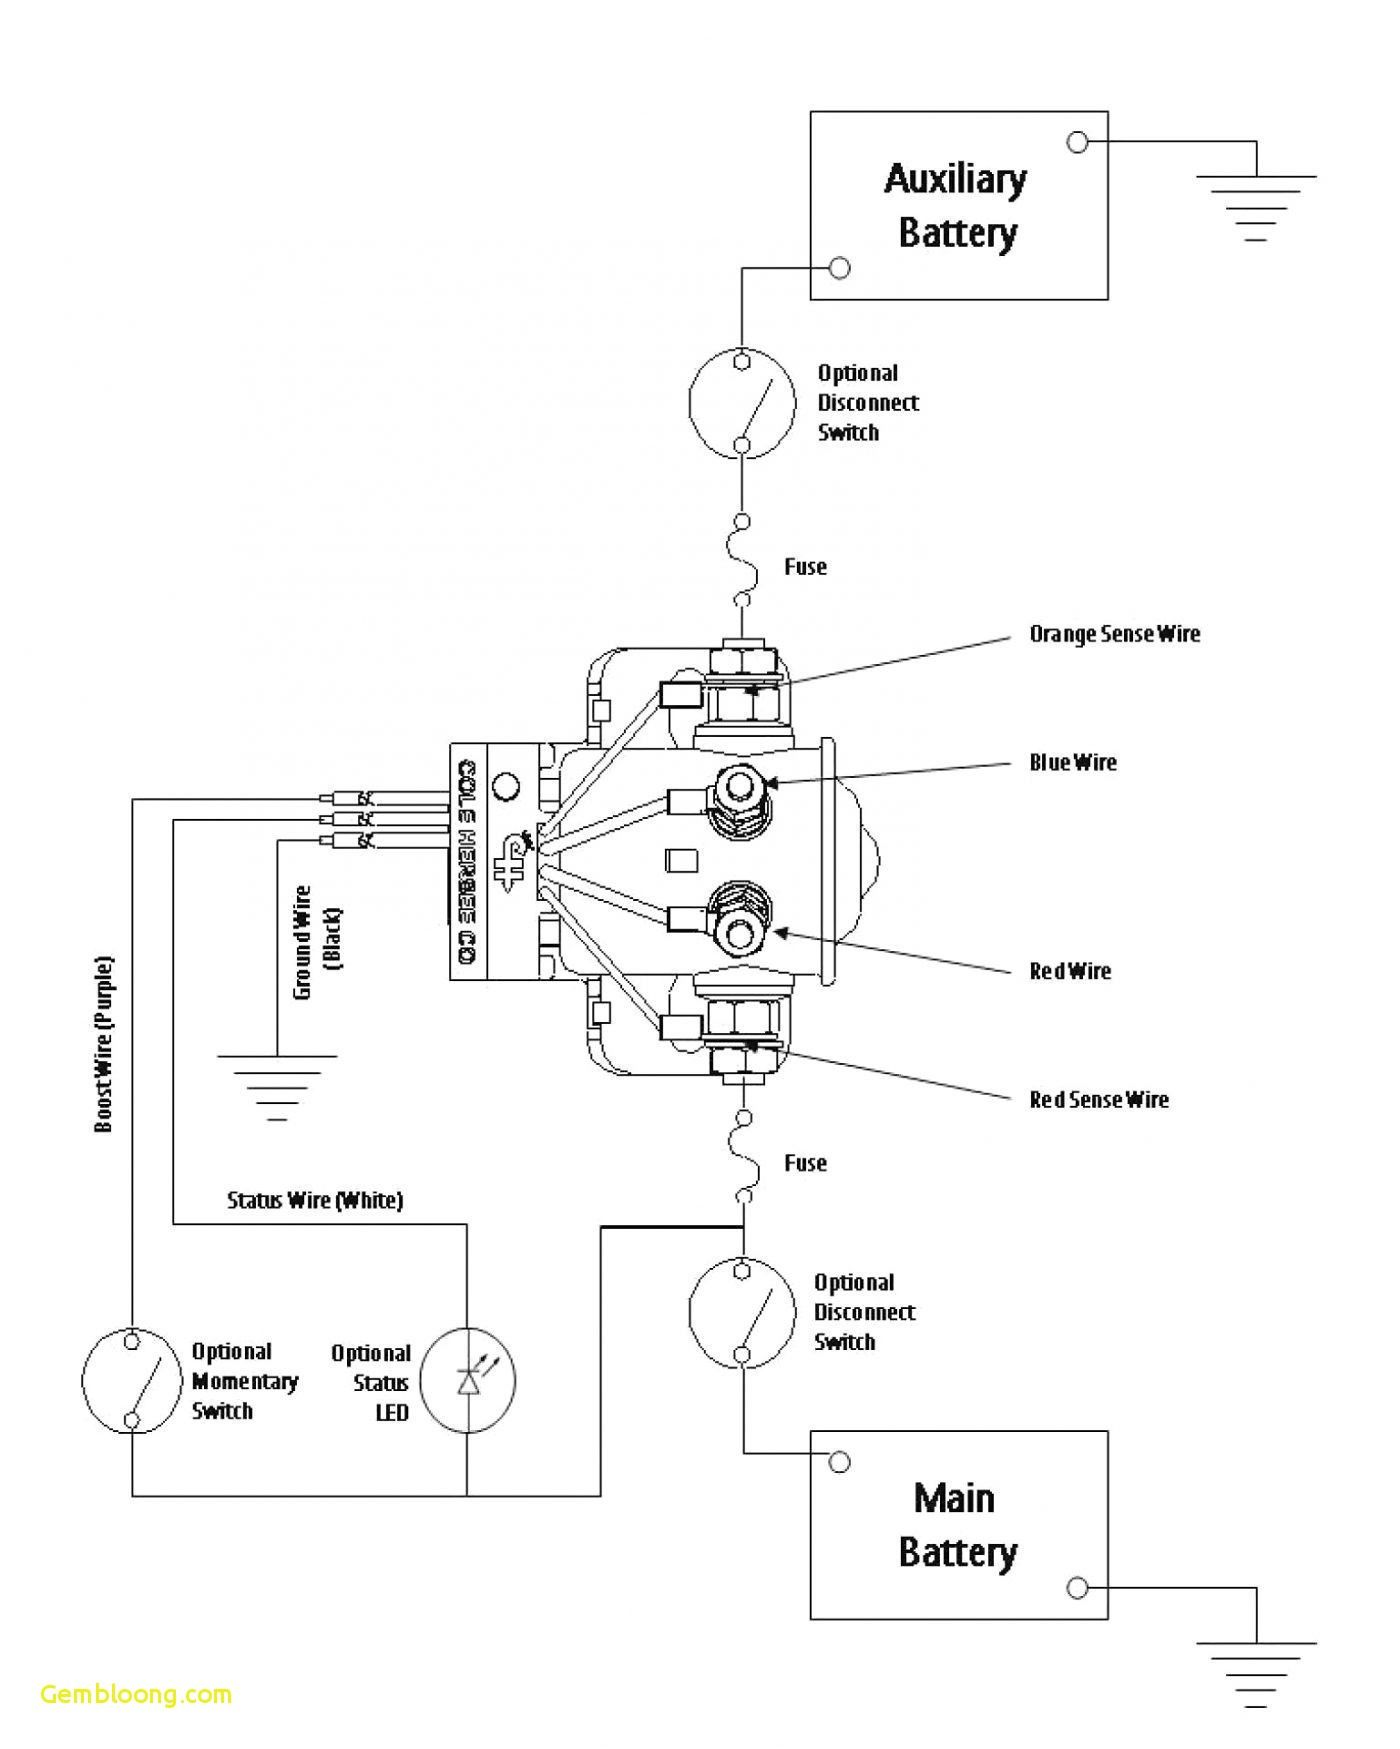 ford contour wiring diagram bmw e46 coupe wiring diagram diagram diagramtemplate  bmw e46 coupe wiring diagram diagram